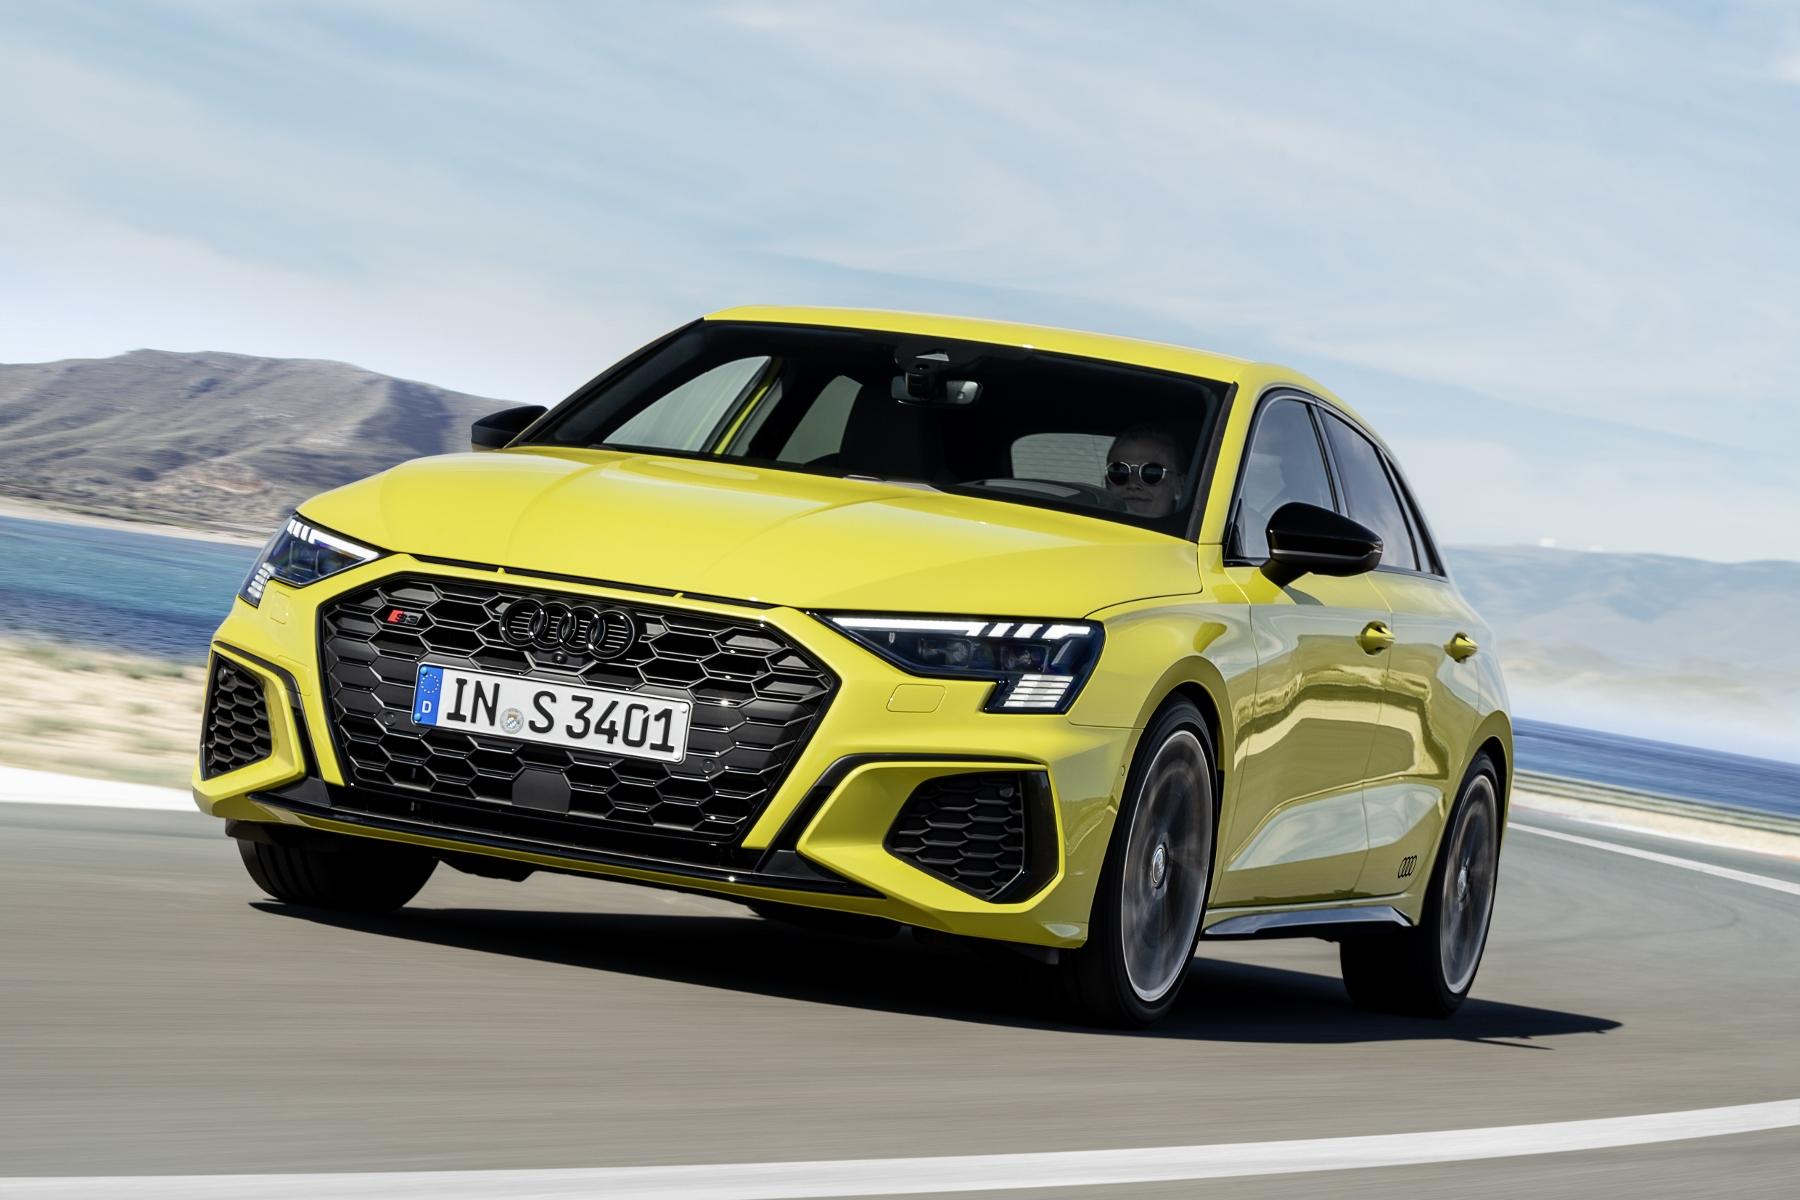 Audi ukázalo modely S3 Sedan a Sportback. Prezradilo aj nemeckú cenu qpOgAqU6ai a204409large-1800x12